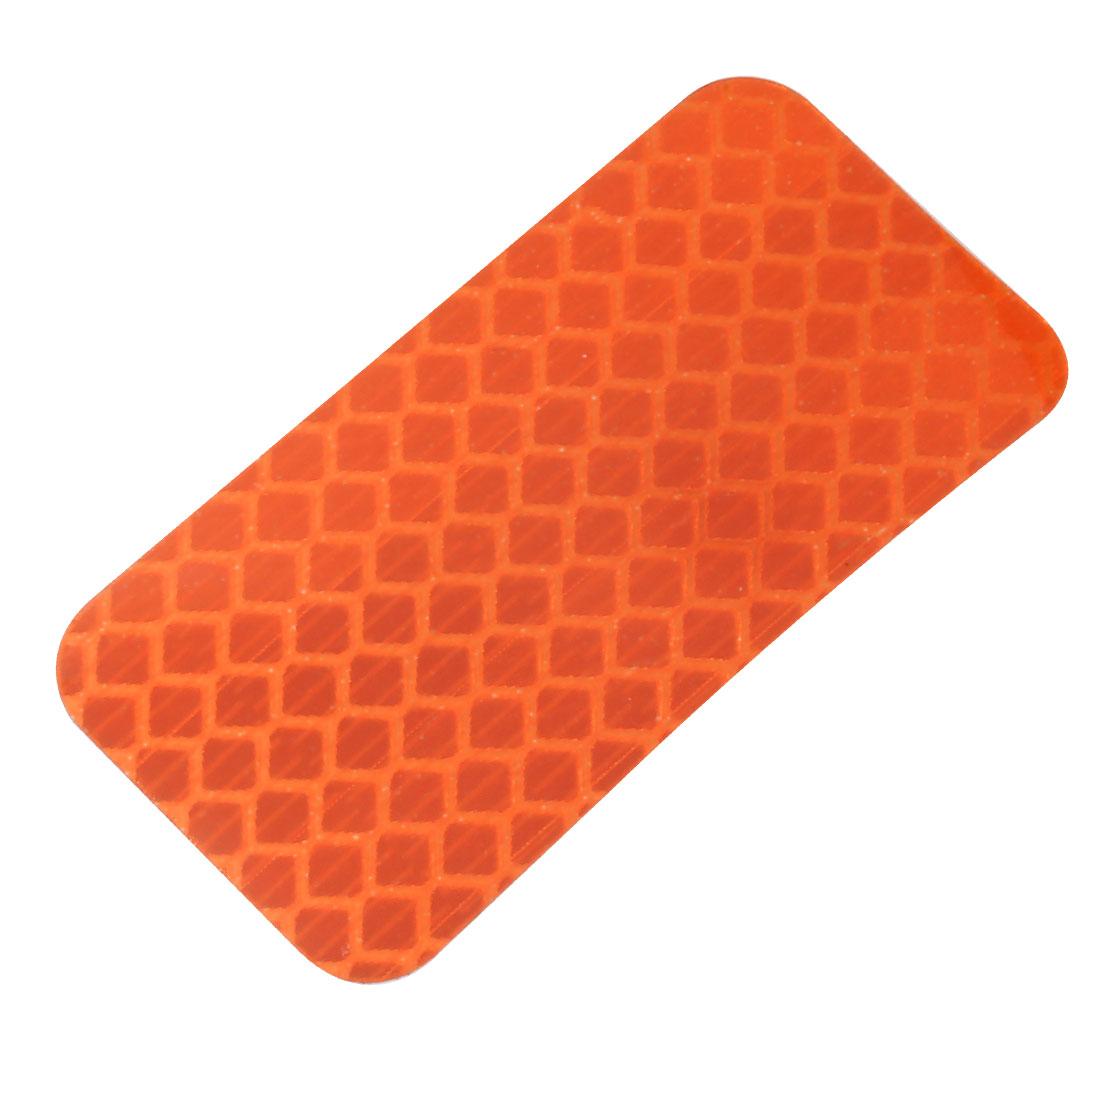 Honeycomb Reflective Warning Tape Film Sticker Orange 30mm x 60mm